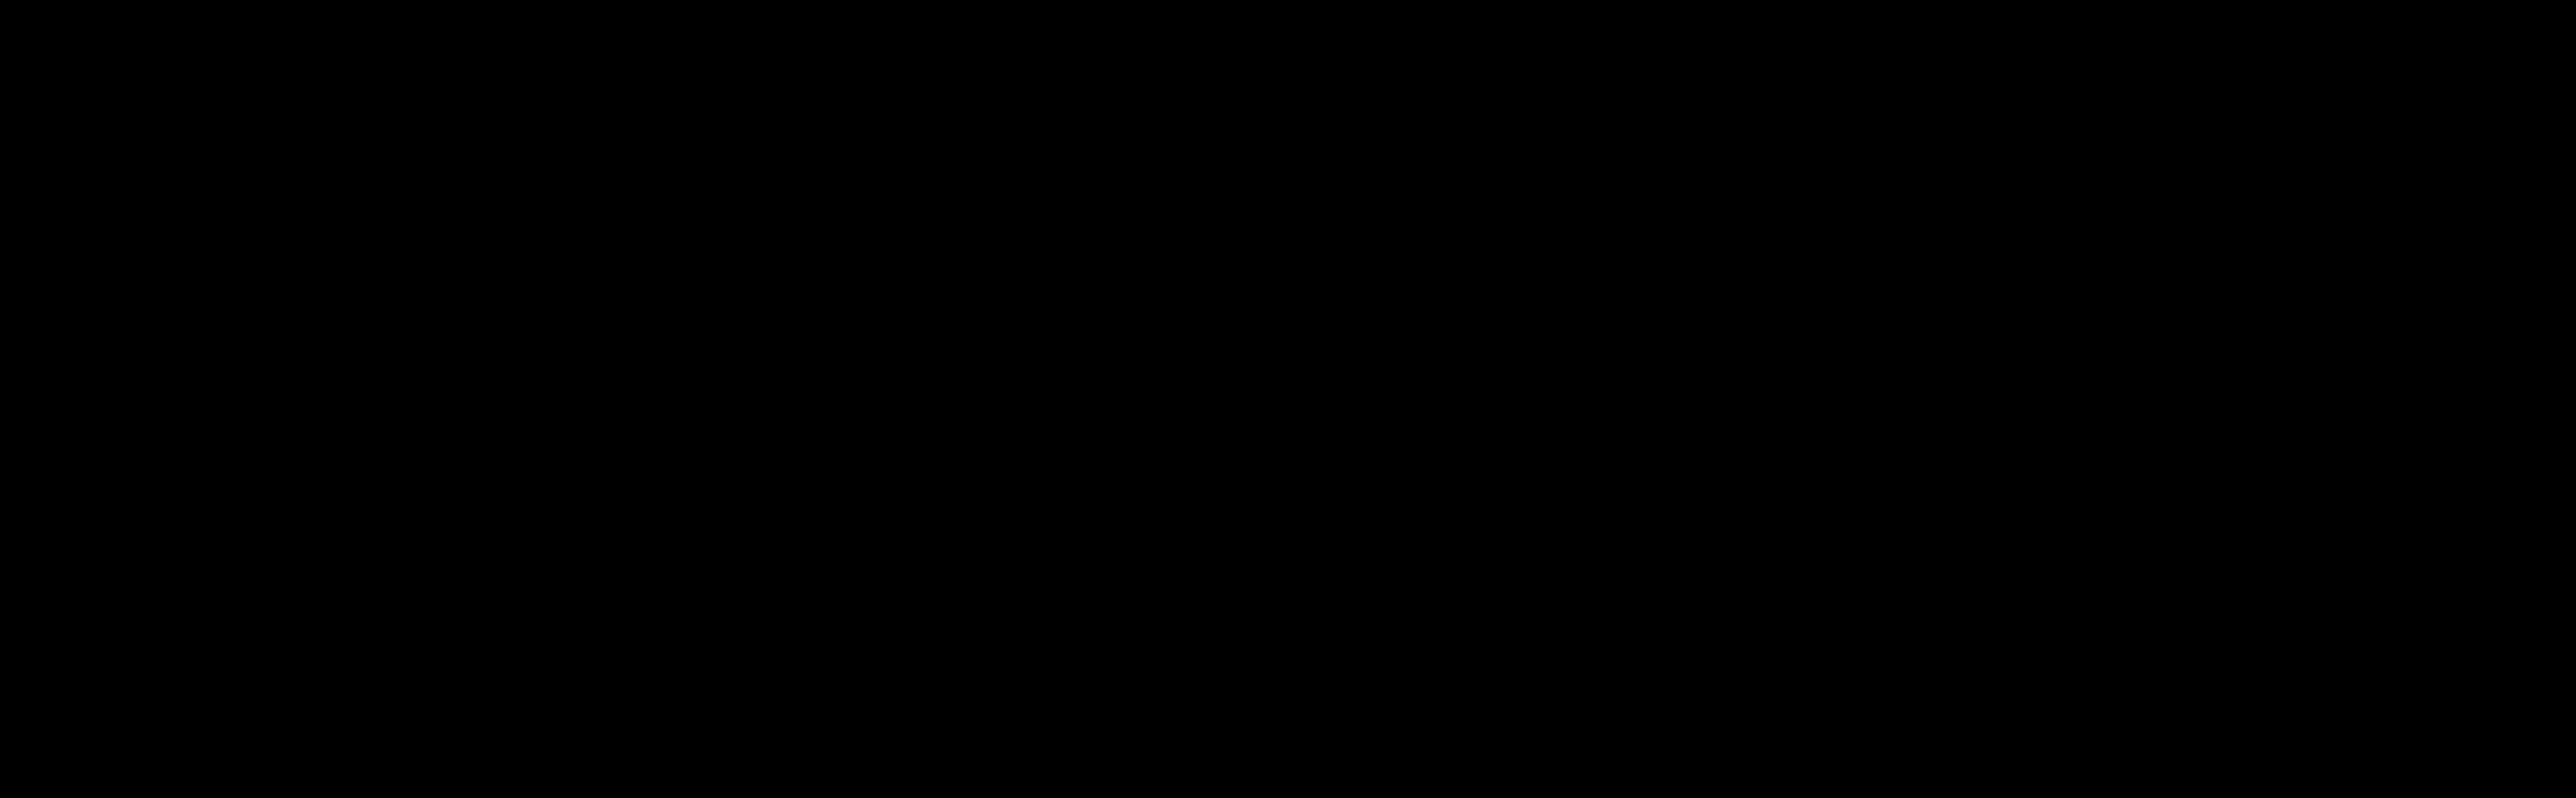 Daclatasvir-d<sub>6</sub> dihydrochloride